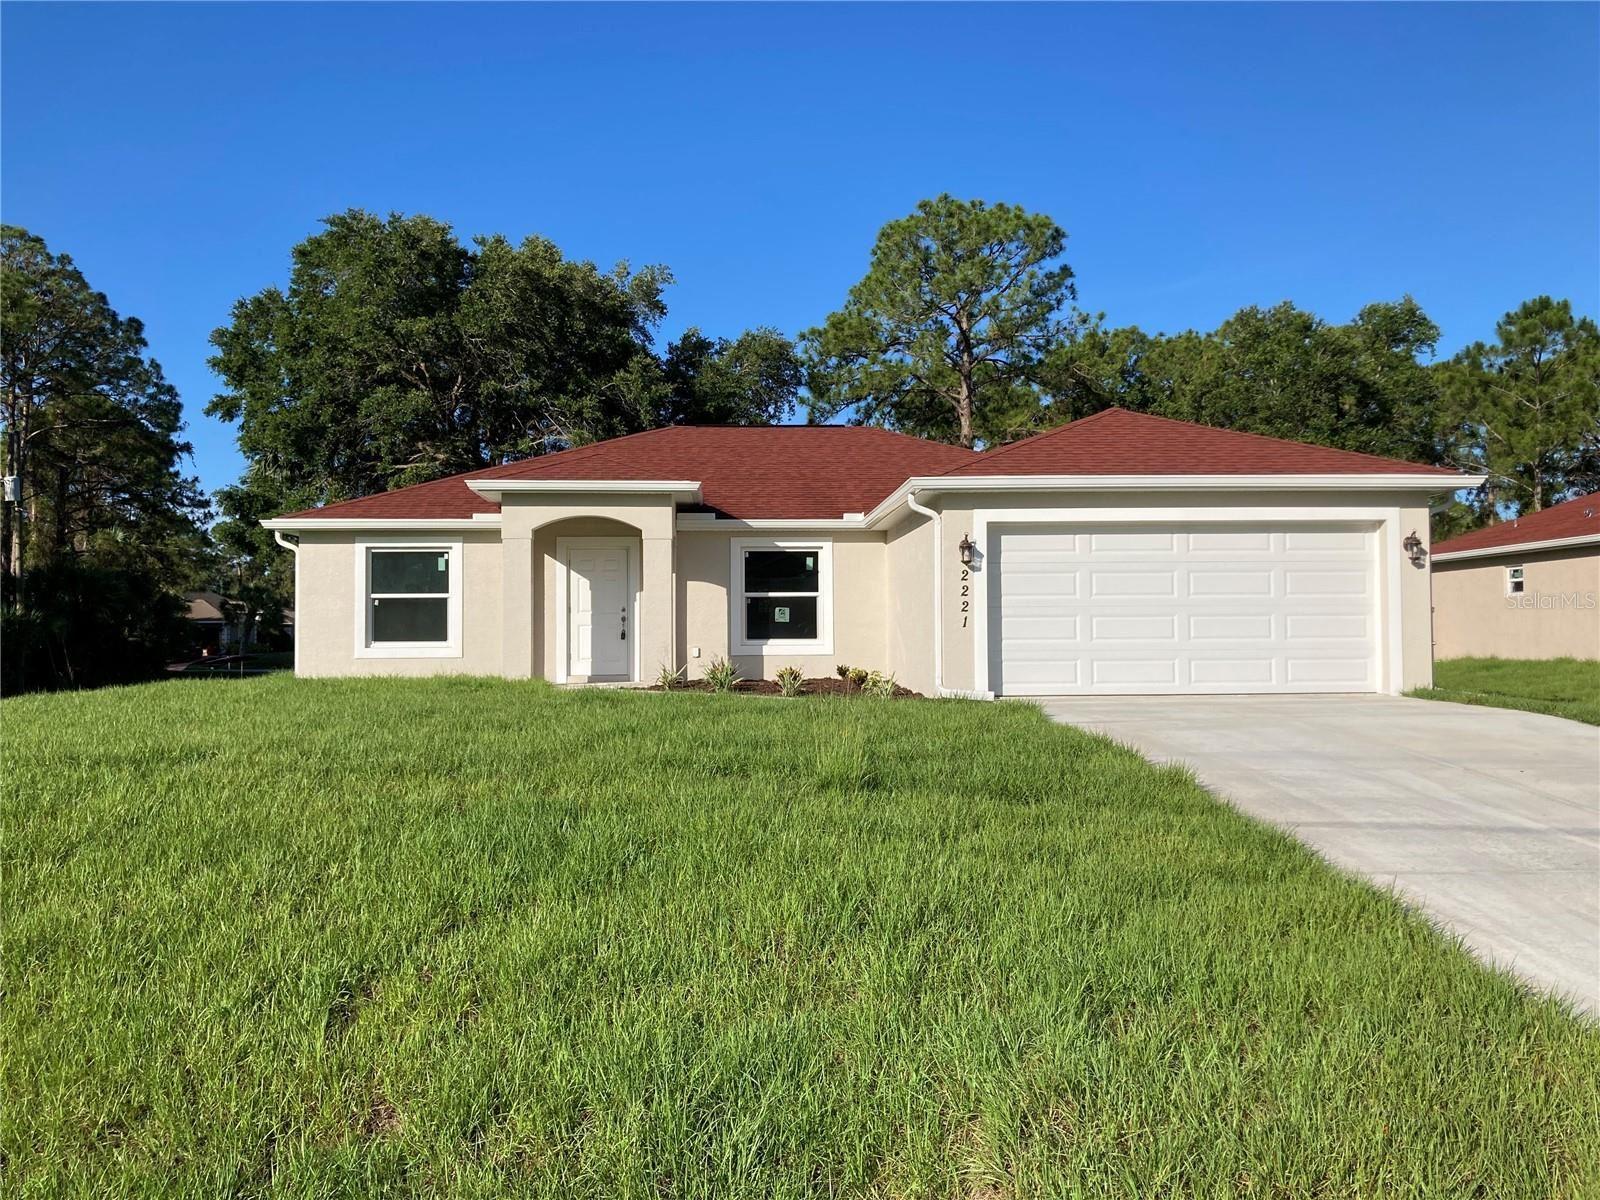 Photo of 2221 SHEILA LANE, NORTH PORT, FL 34286 (MLS # C7444900)